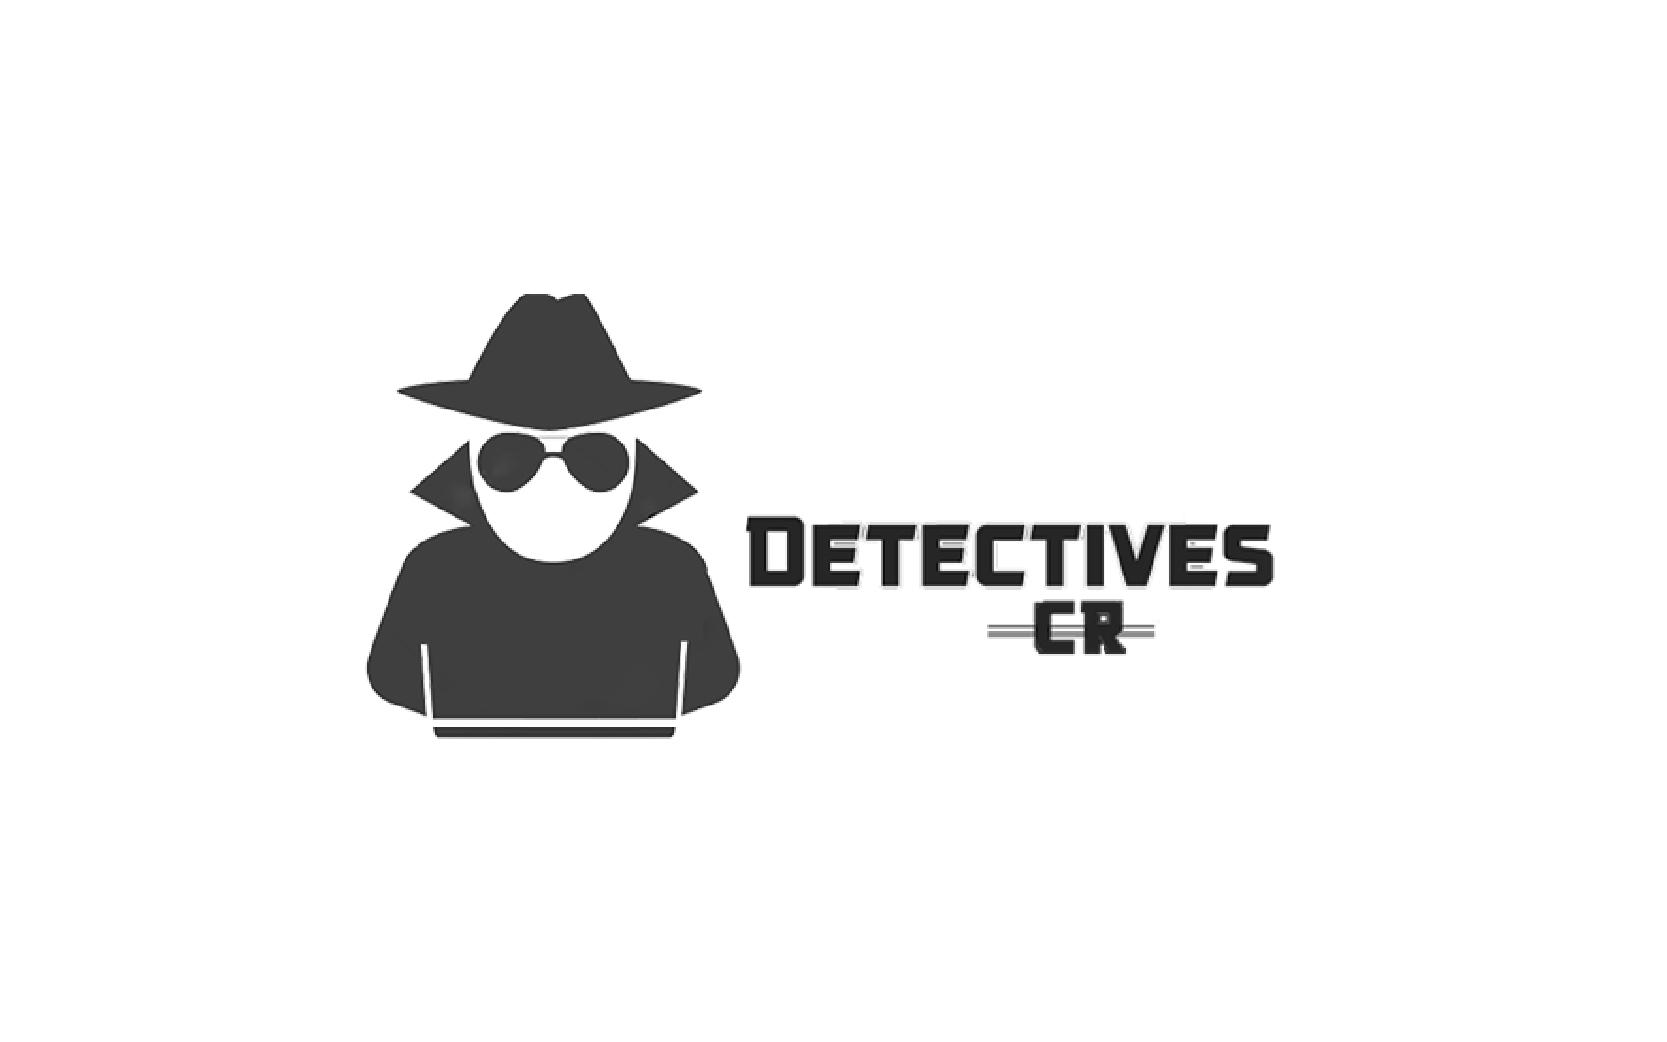 logo-detectives-cr